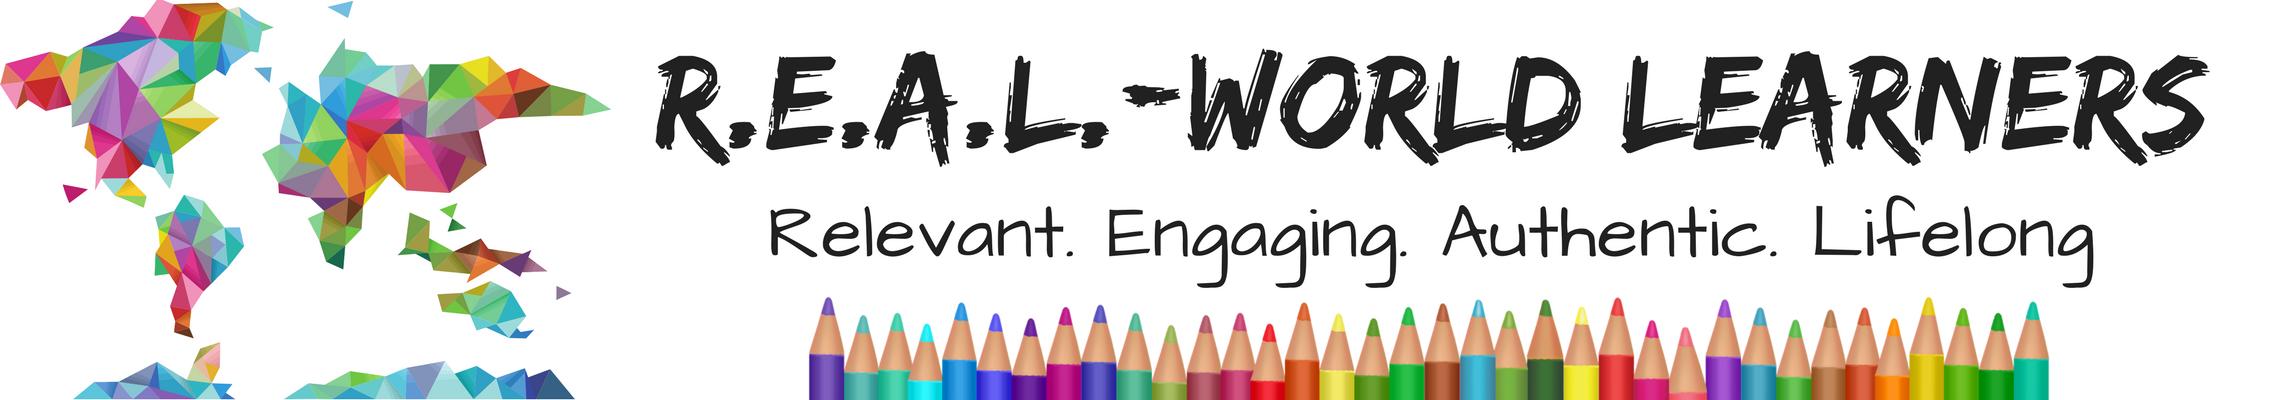 R.E.A.L.-World Learners (5)